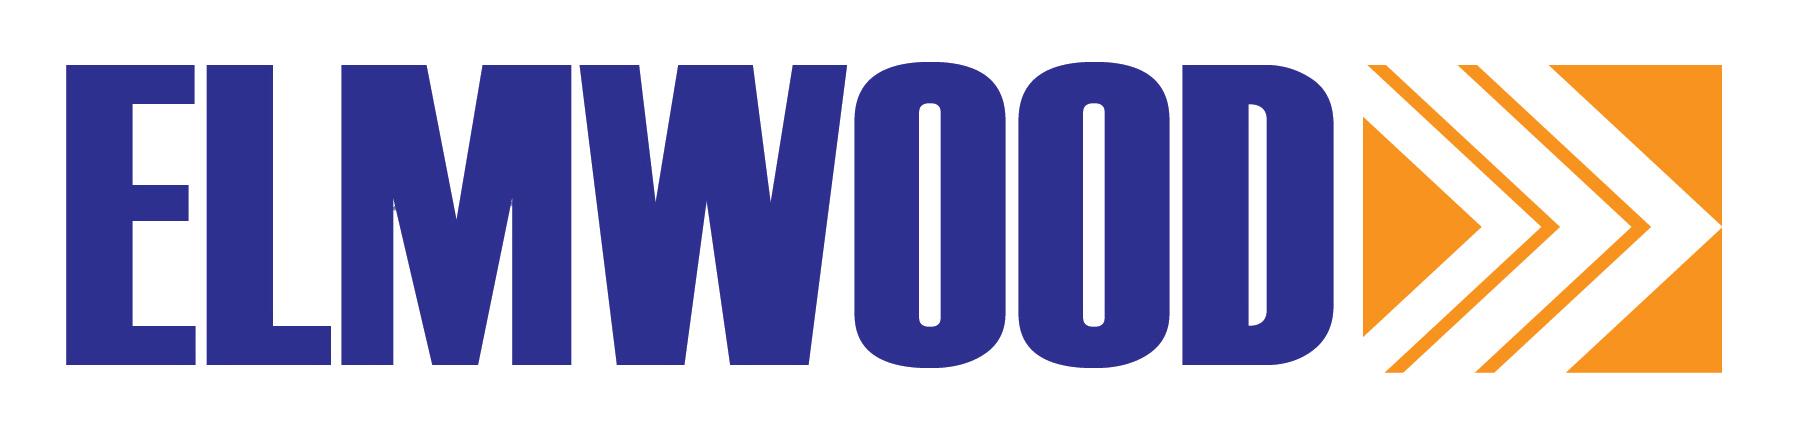 elmwood-consulting.jpg